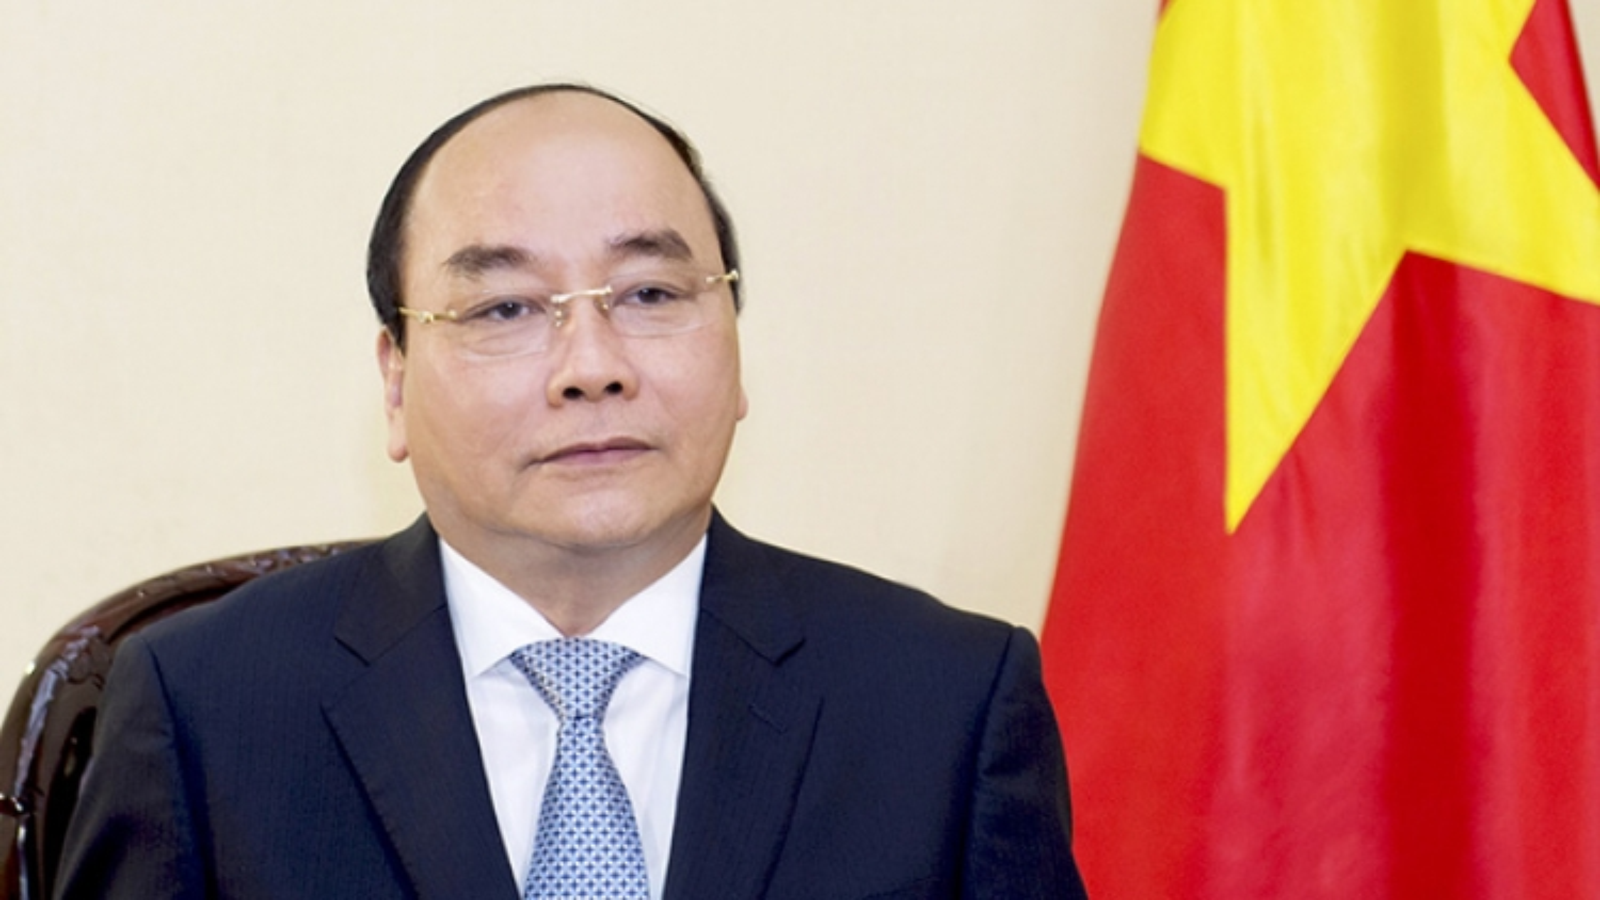 PM Phuc to visit Singapore, attend ASEAN Summit